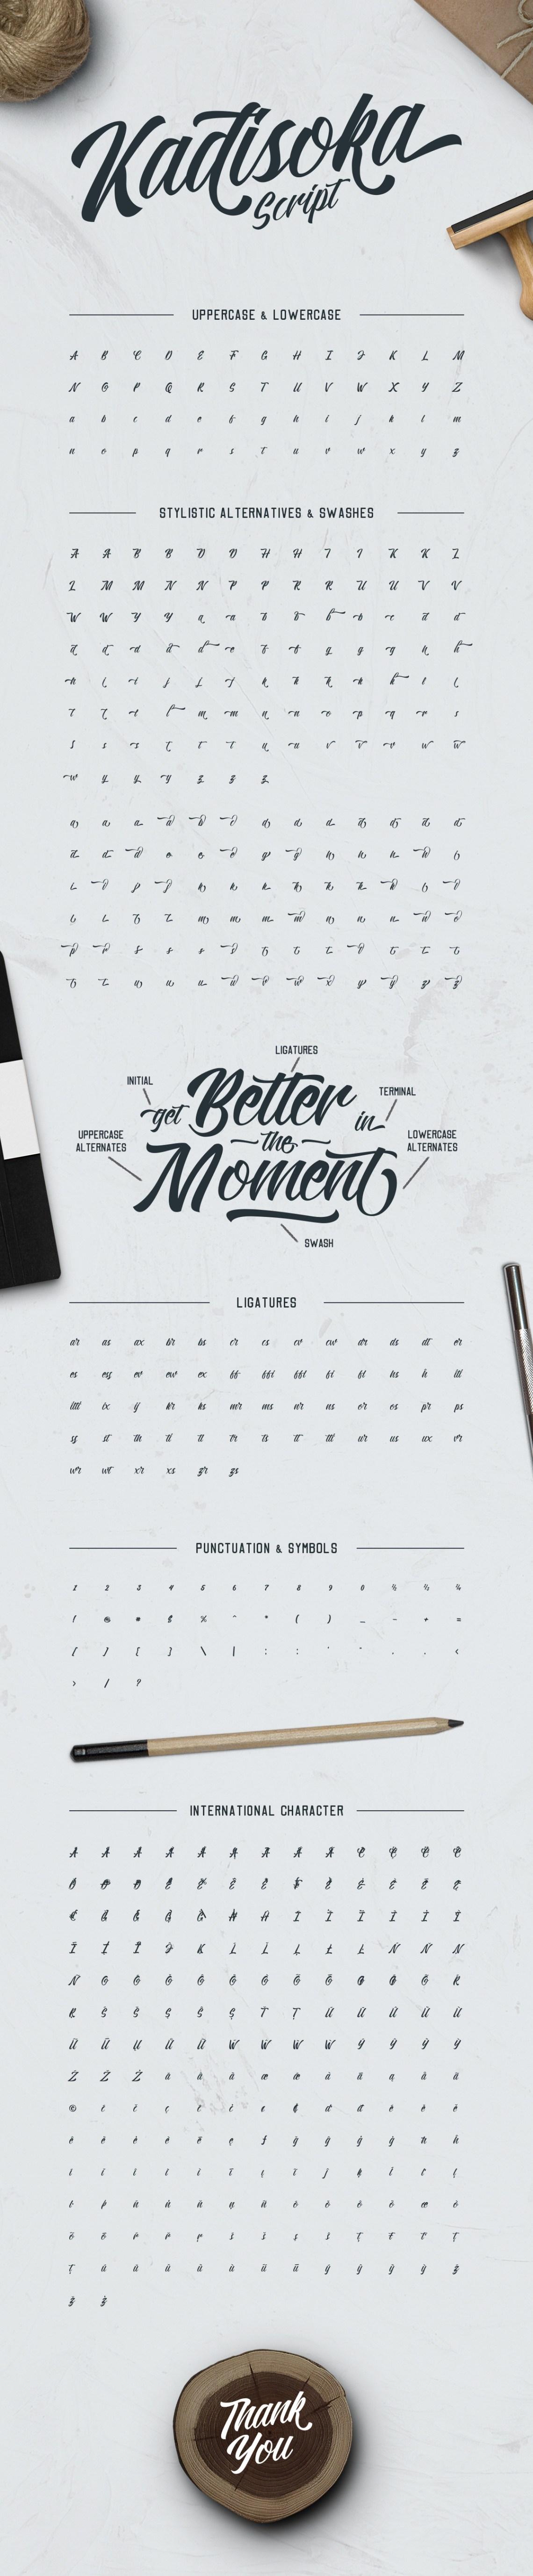 Download Kadisoka Font Pack by letterhend | GraphicRiver